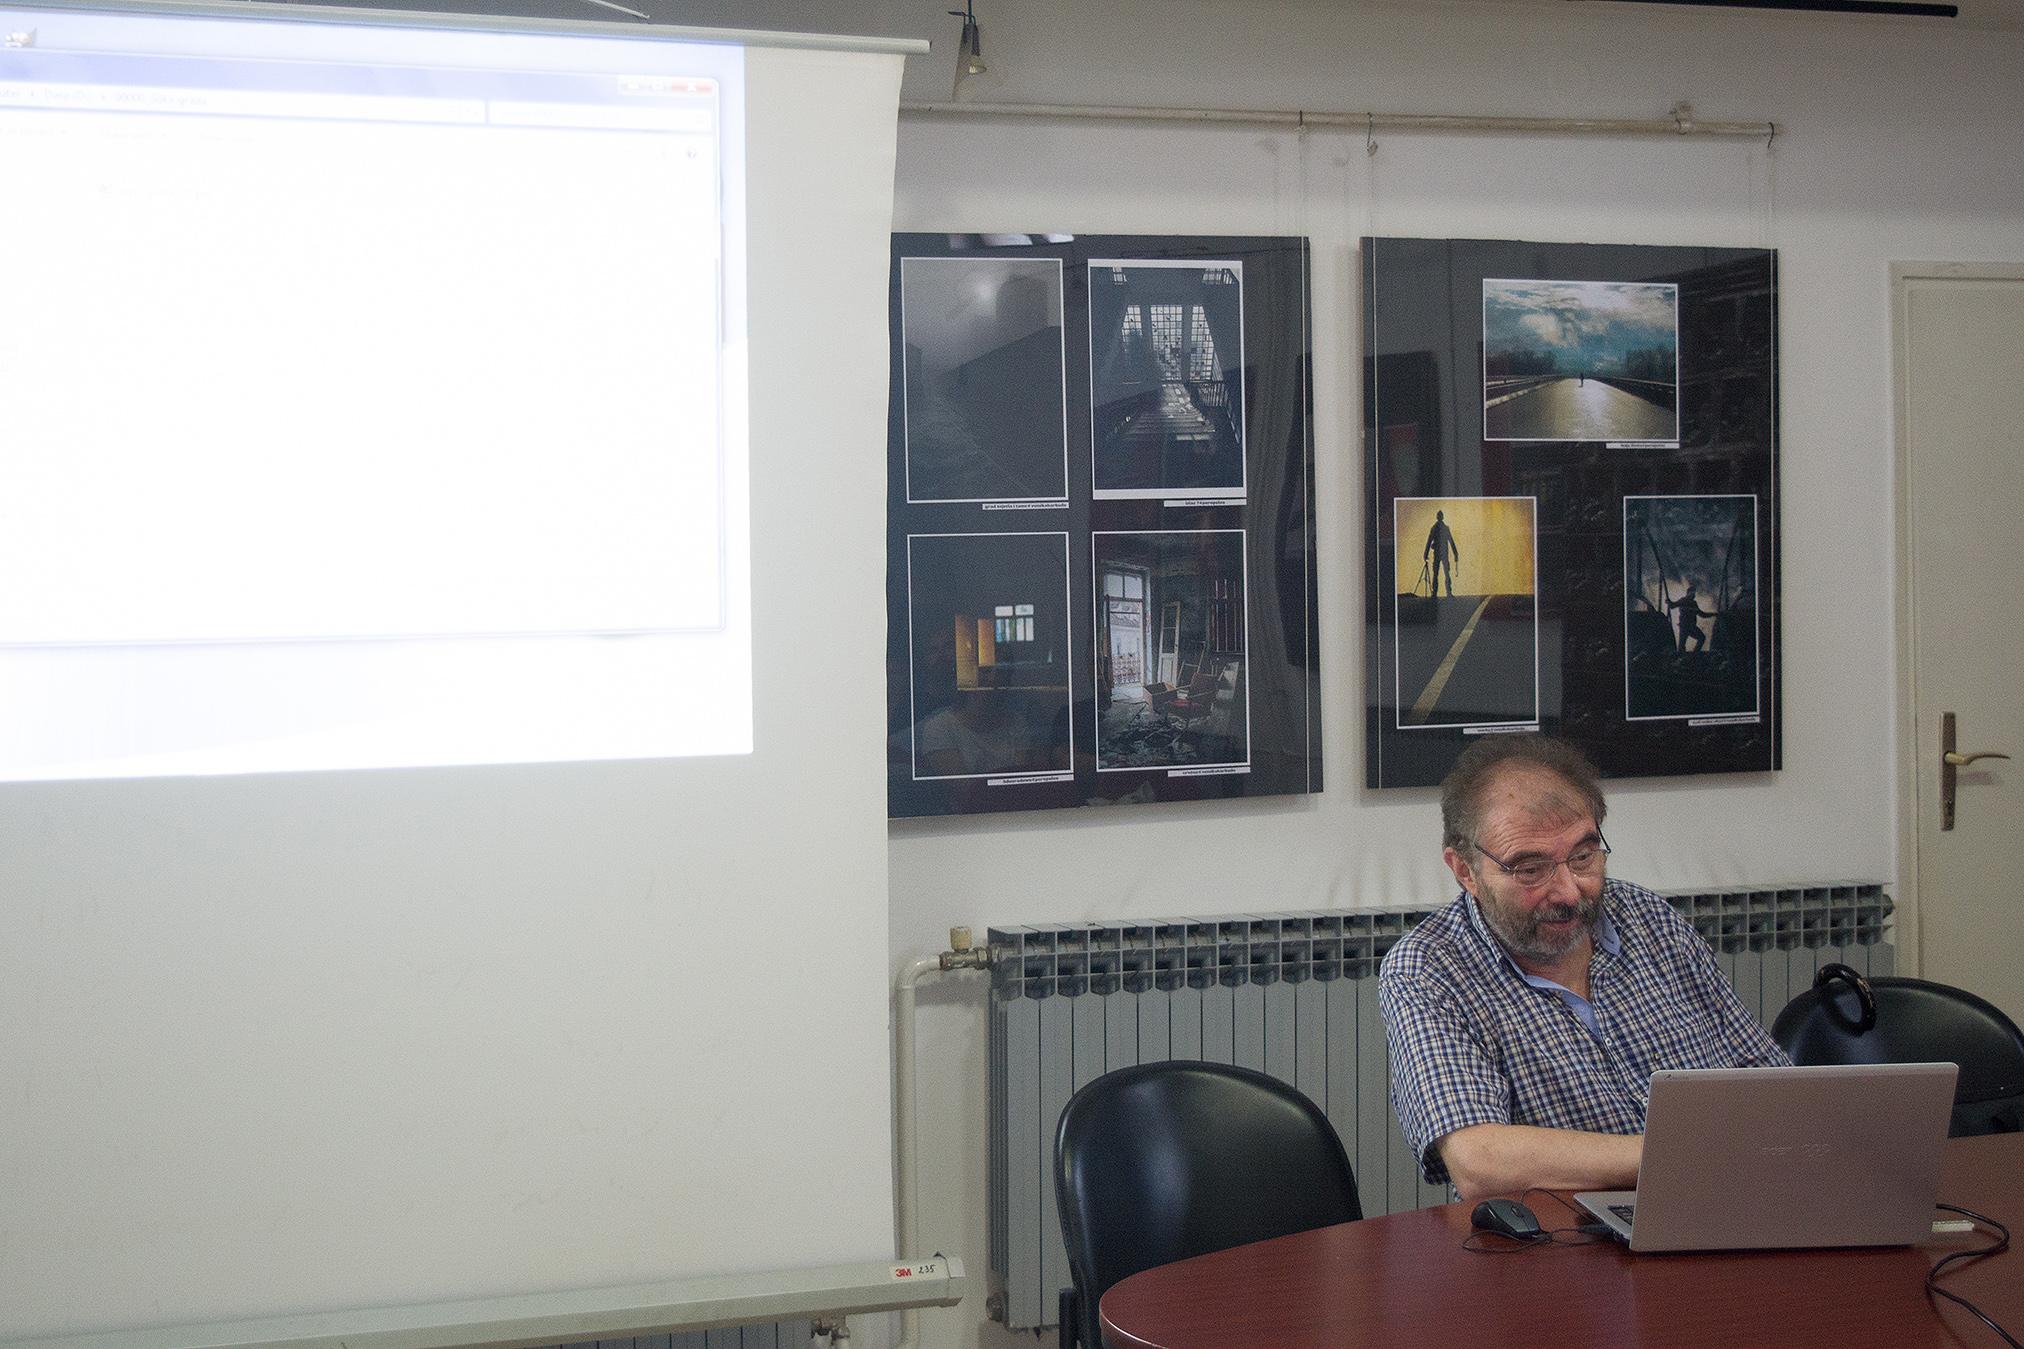 Vladimir Petrović, Knjižnica za mlade, Karlovac, 20. 6. 2017. Foto: Marinko Polović